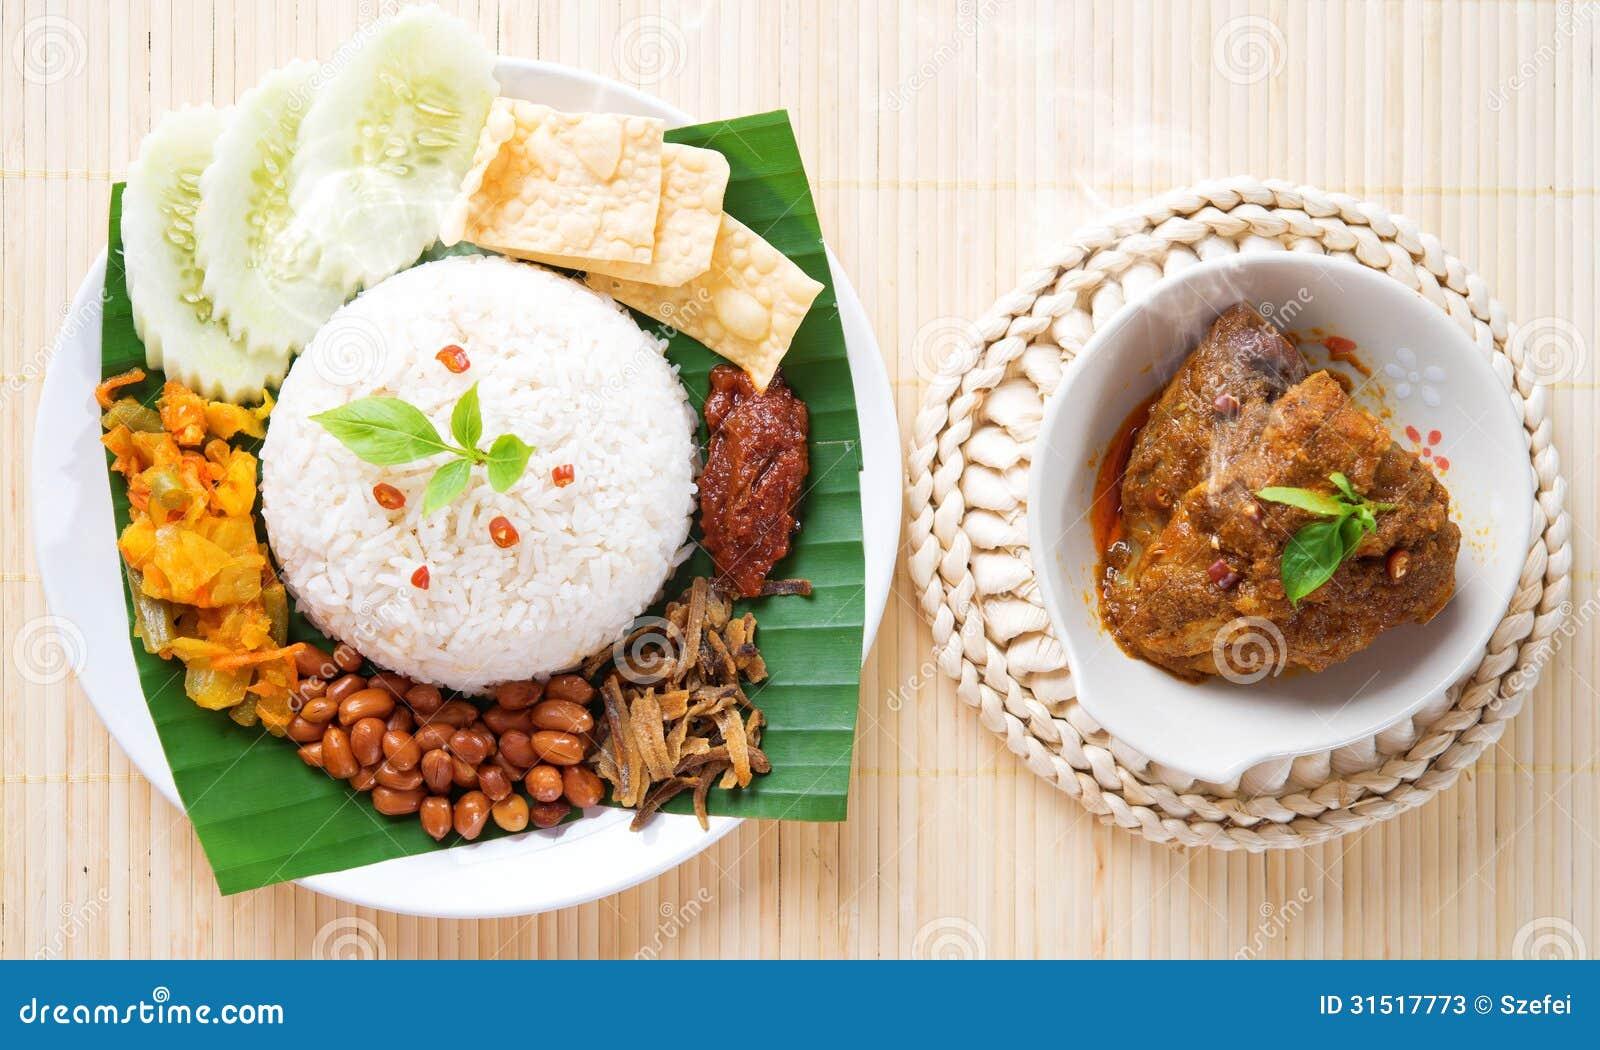 Nasi lemak hot and spicy